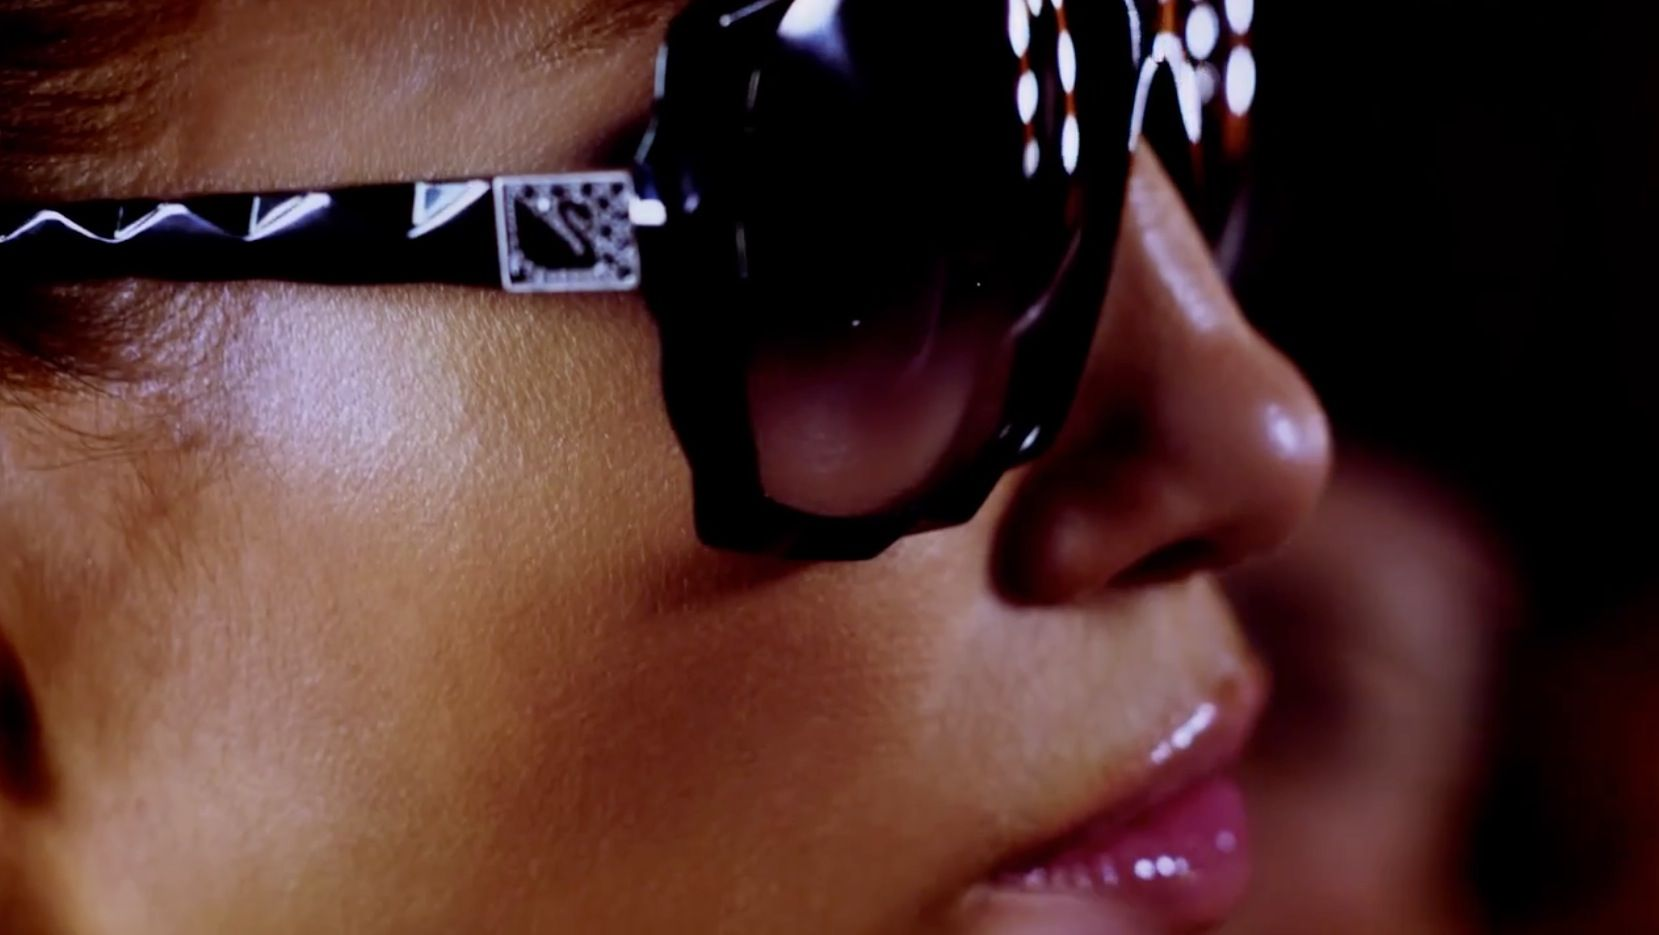 d48ae848155 Swarovski SK0002 sunglasses worn by Jennifer Lopez in LIVE IT UP by Jennifer  Lopez (2013)  Swarovski